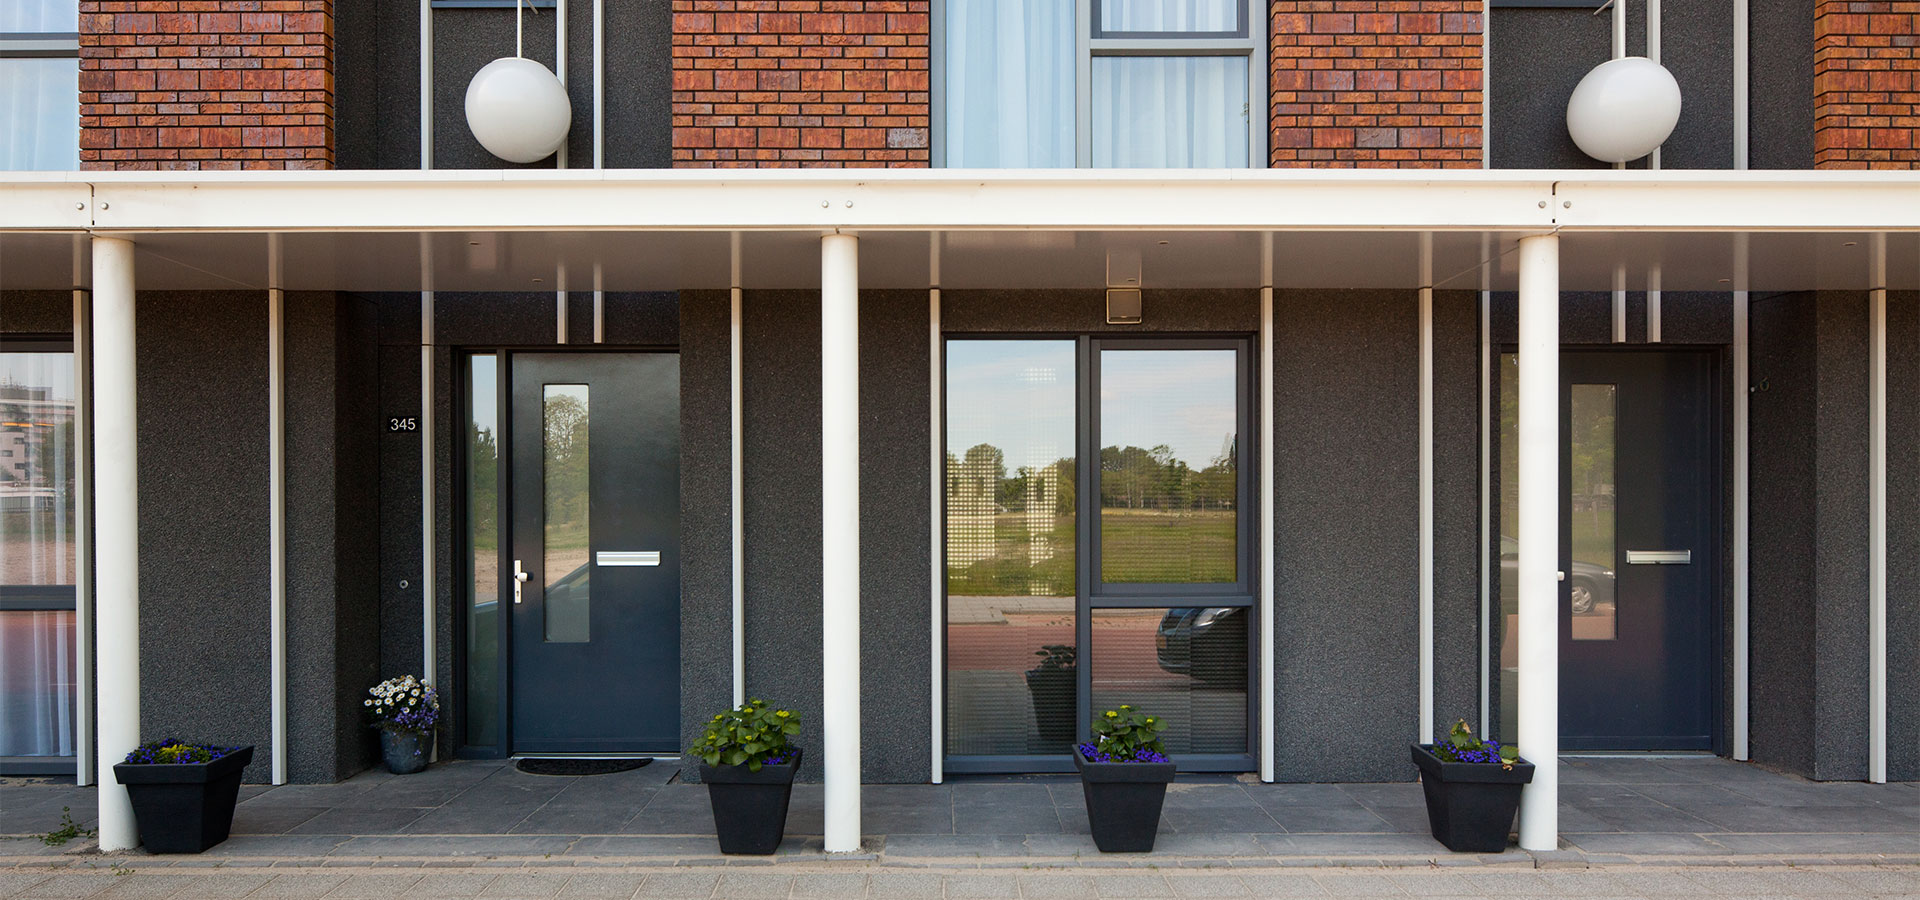 FARO architecten Dijkzone Oedevlietsepark Rotterdam 01